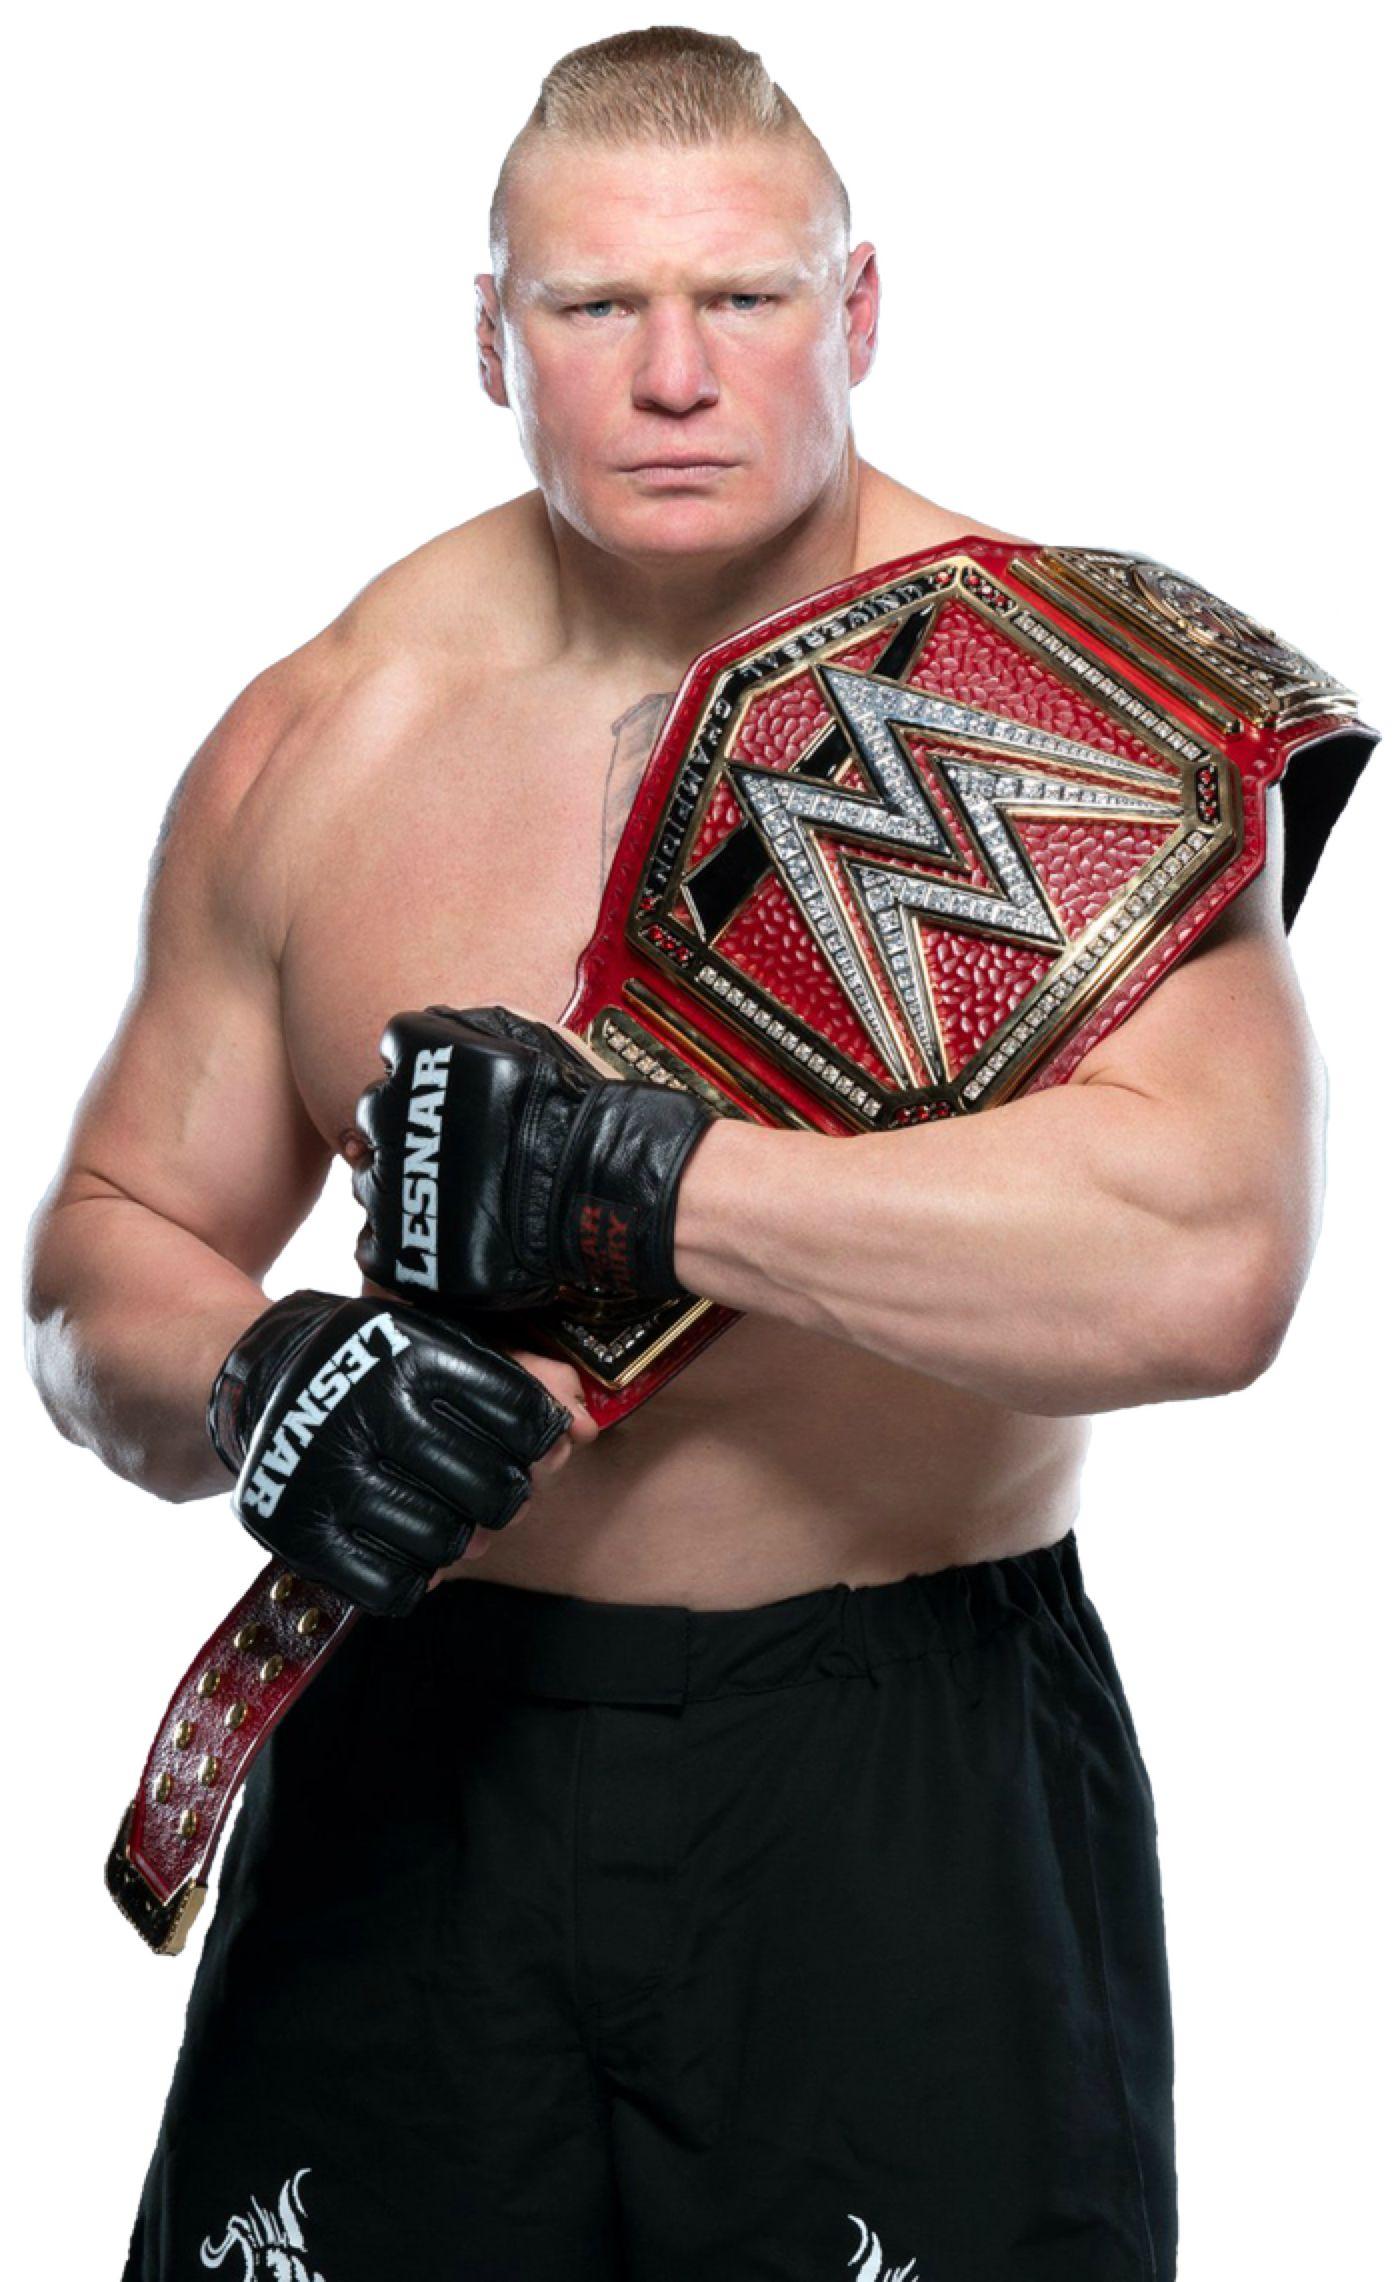 Brock Lesnar Universal Champion 2019 By Nuruddinayobwwe On Deviantart Brock Lesnar Brock Lesnar Wwe Wwe Superstar Roman Reigns